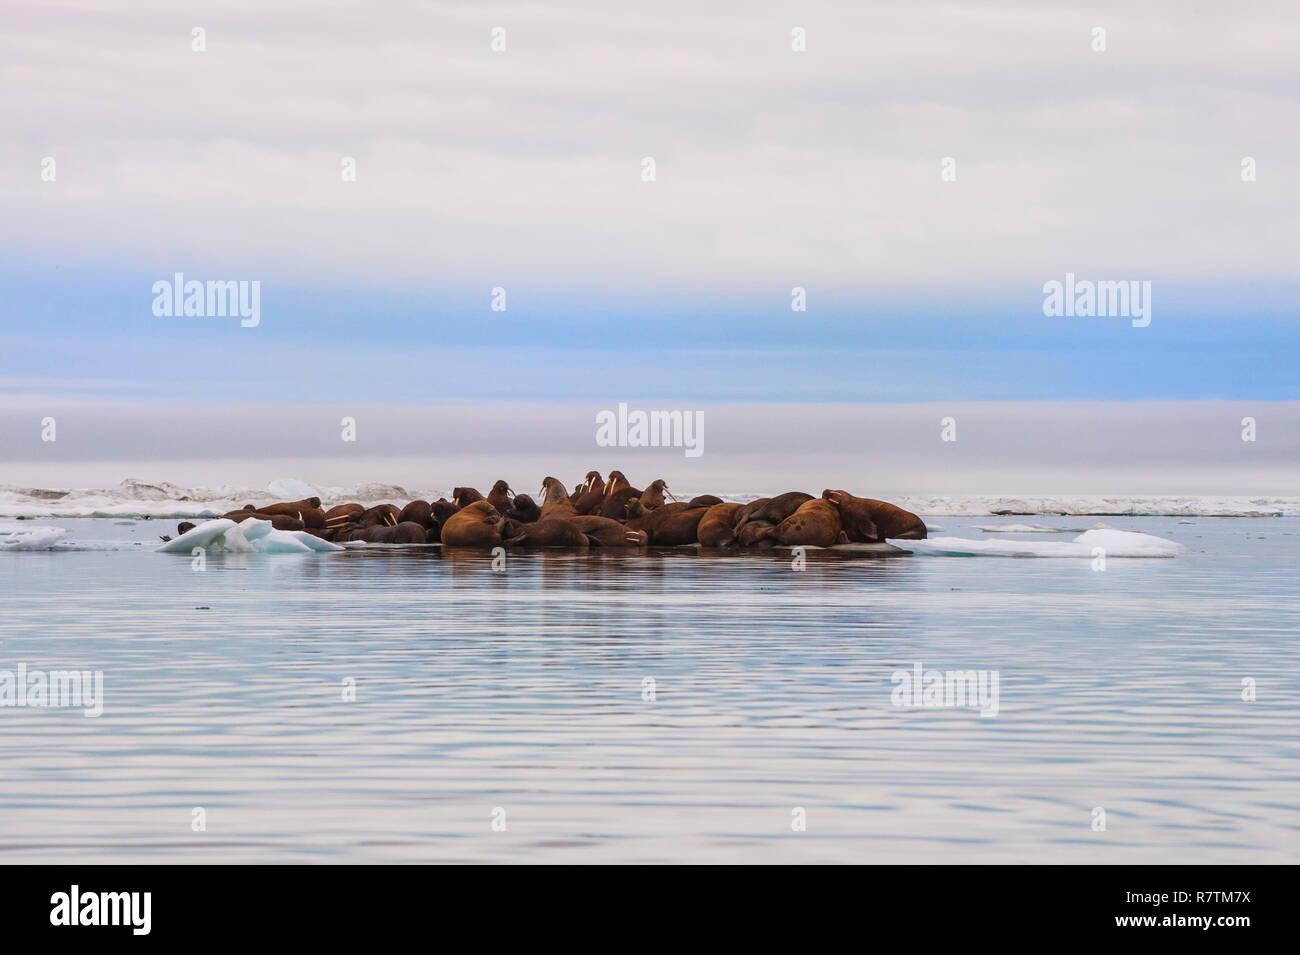 Group of Walruses (Odobenus rosmarus) resting on an ice floe, Wrangel Island, Far Eastern Federal District, Russia - Stock Image